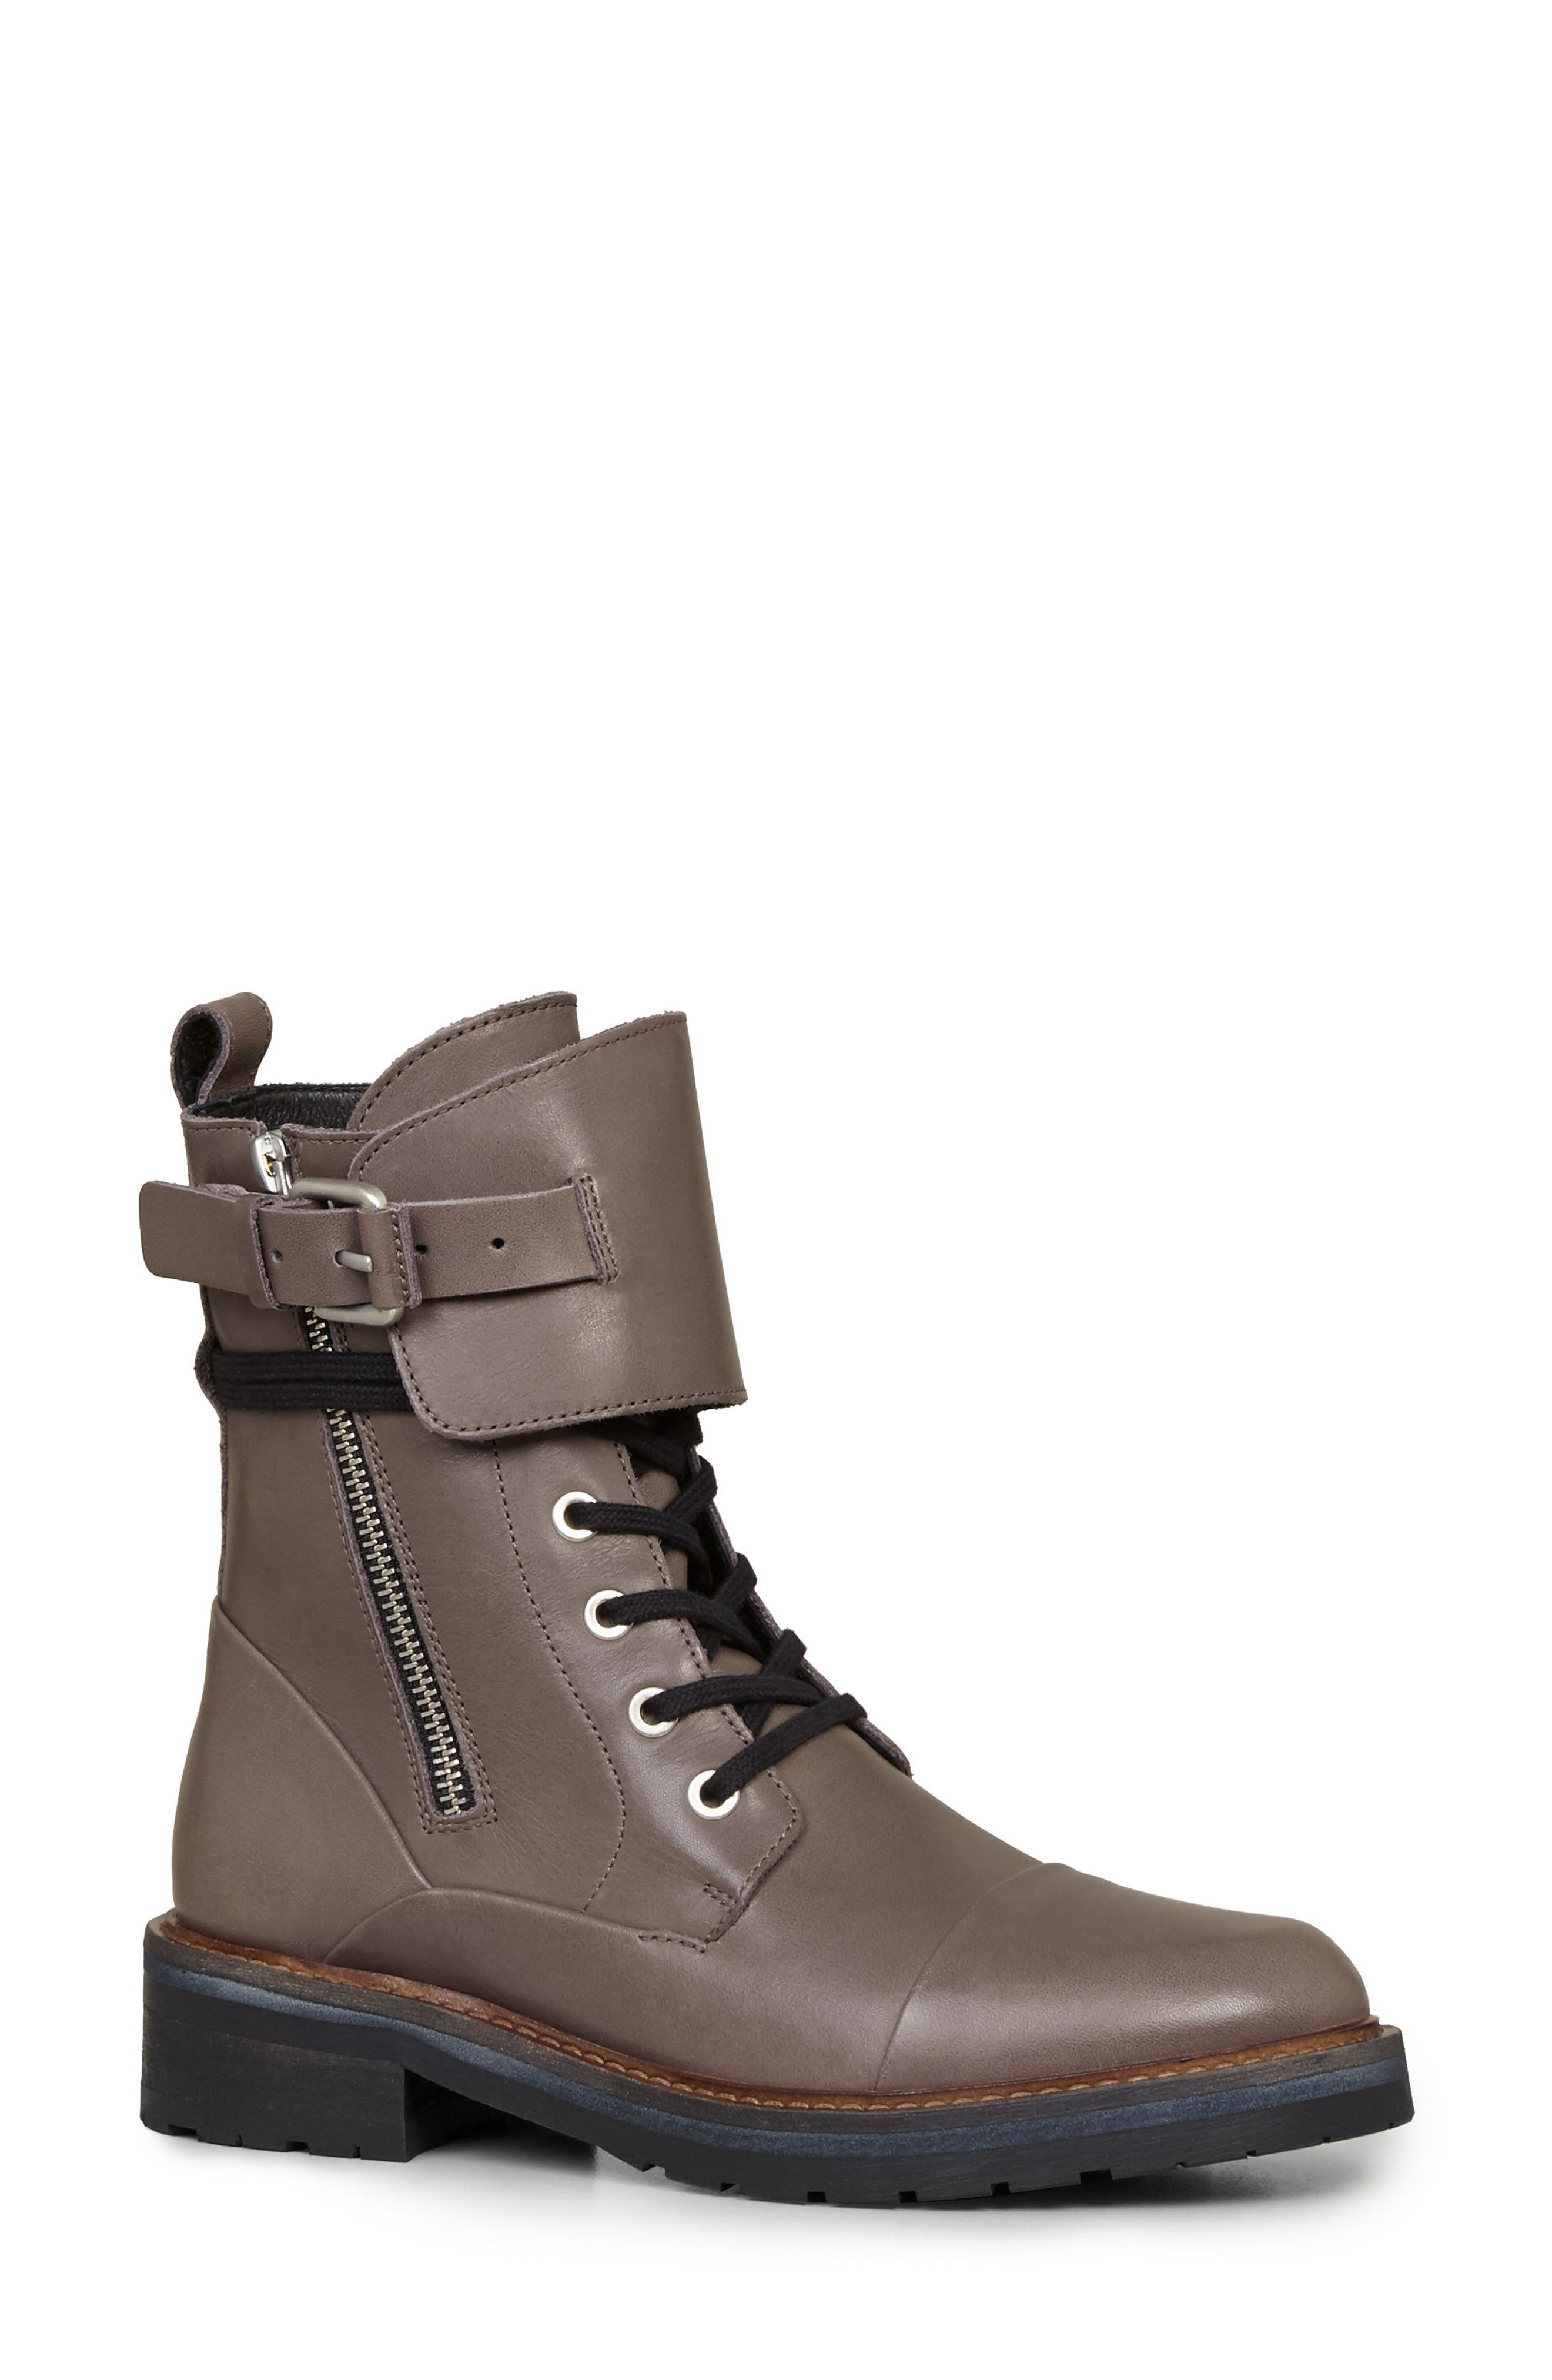 Alternate Image 1 Selected - ALLSAINTS Daria Cuffed Combat Boot (Women)